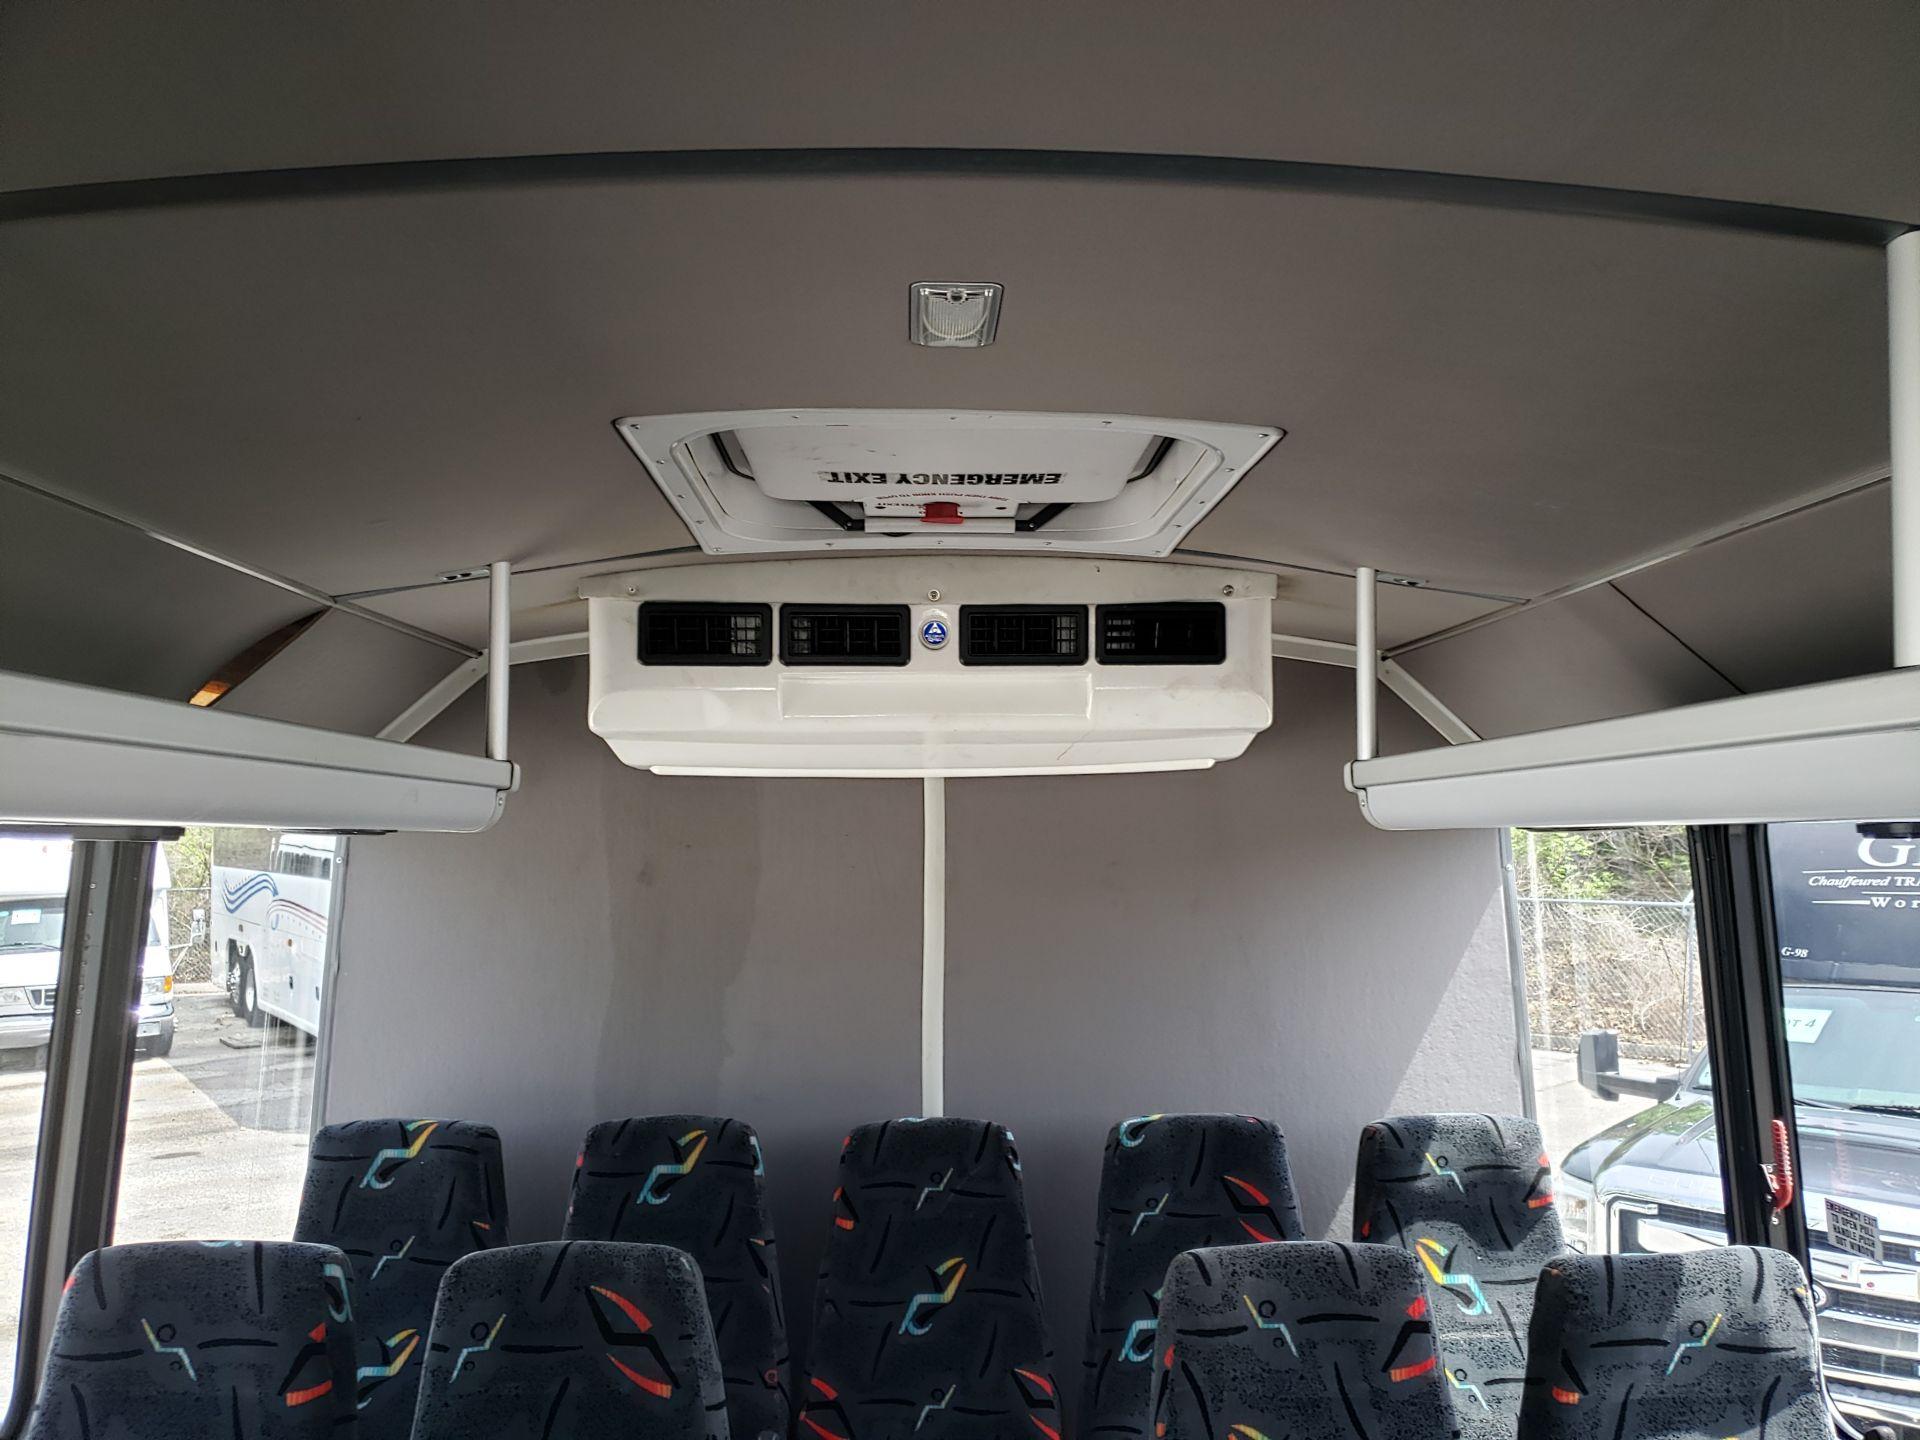 2013 Freightliner M2 106 33-Pass Champion Defender Shuttle Bus - Image 11 of 17